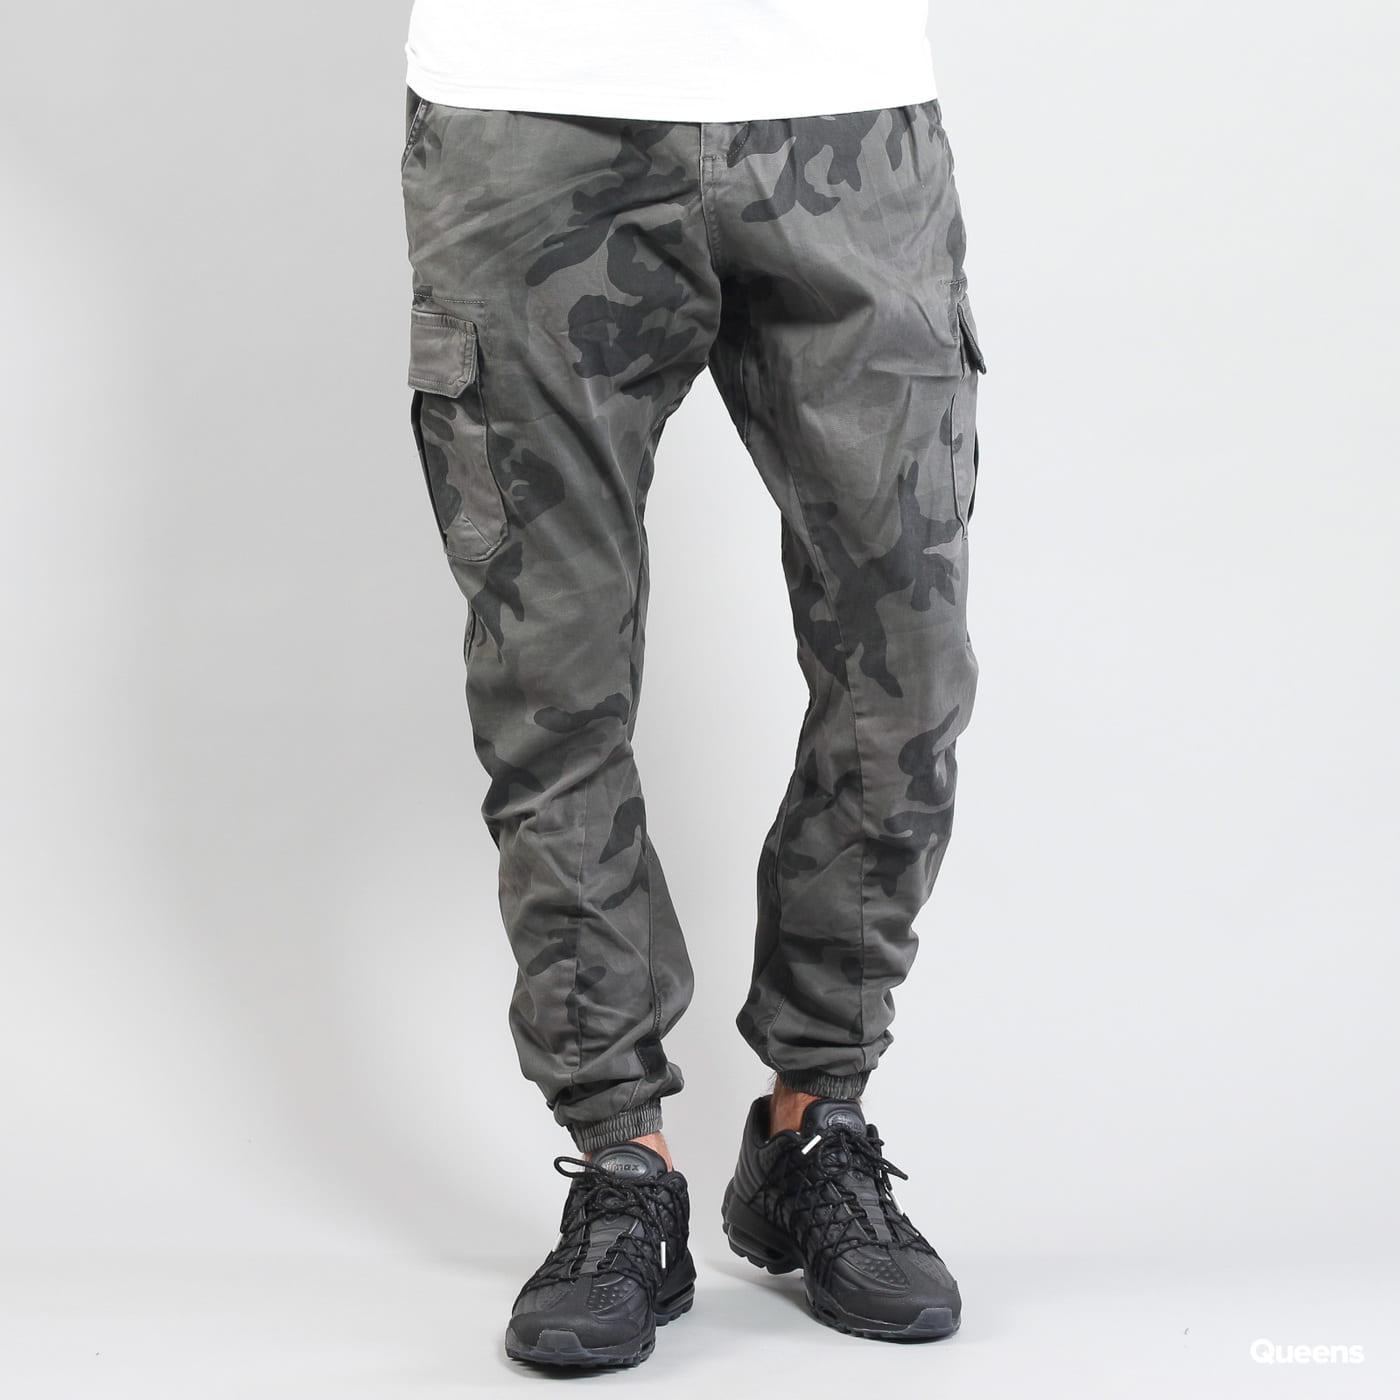 Urban Classics Camo Cargo Jogging Pants camo tmavošedé